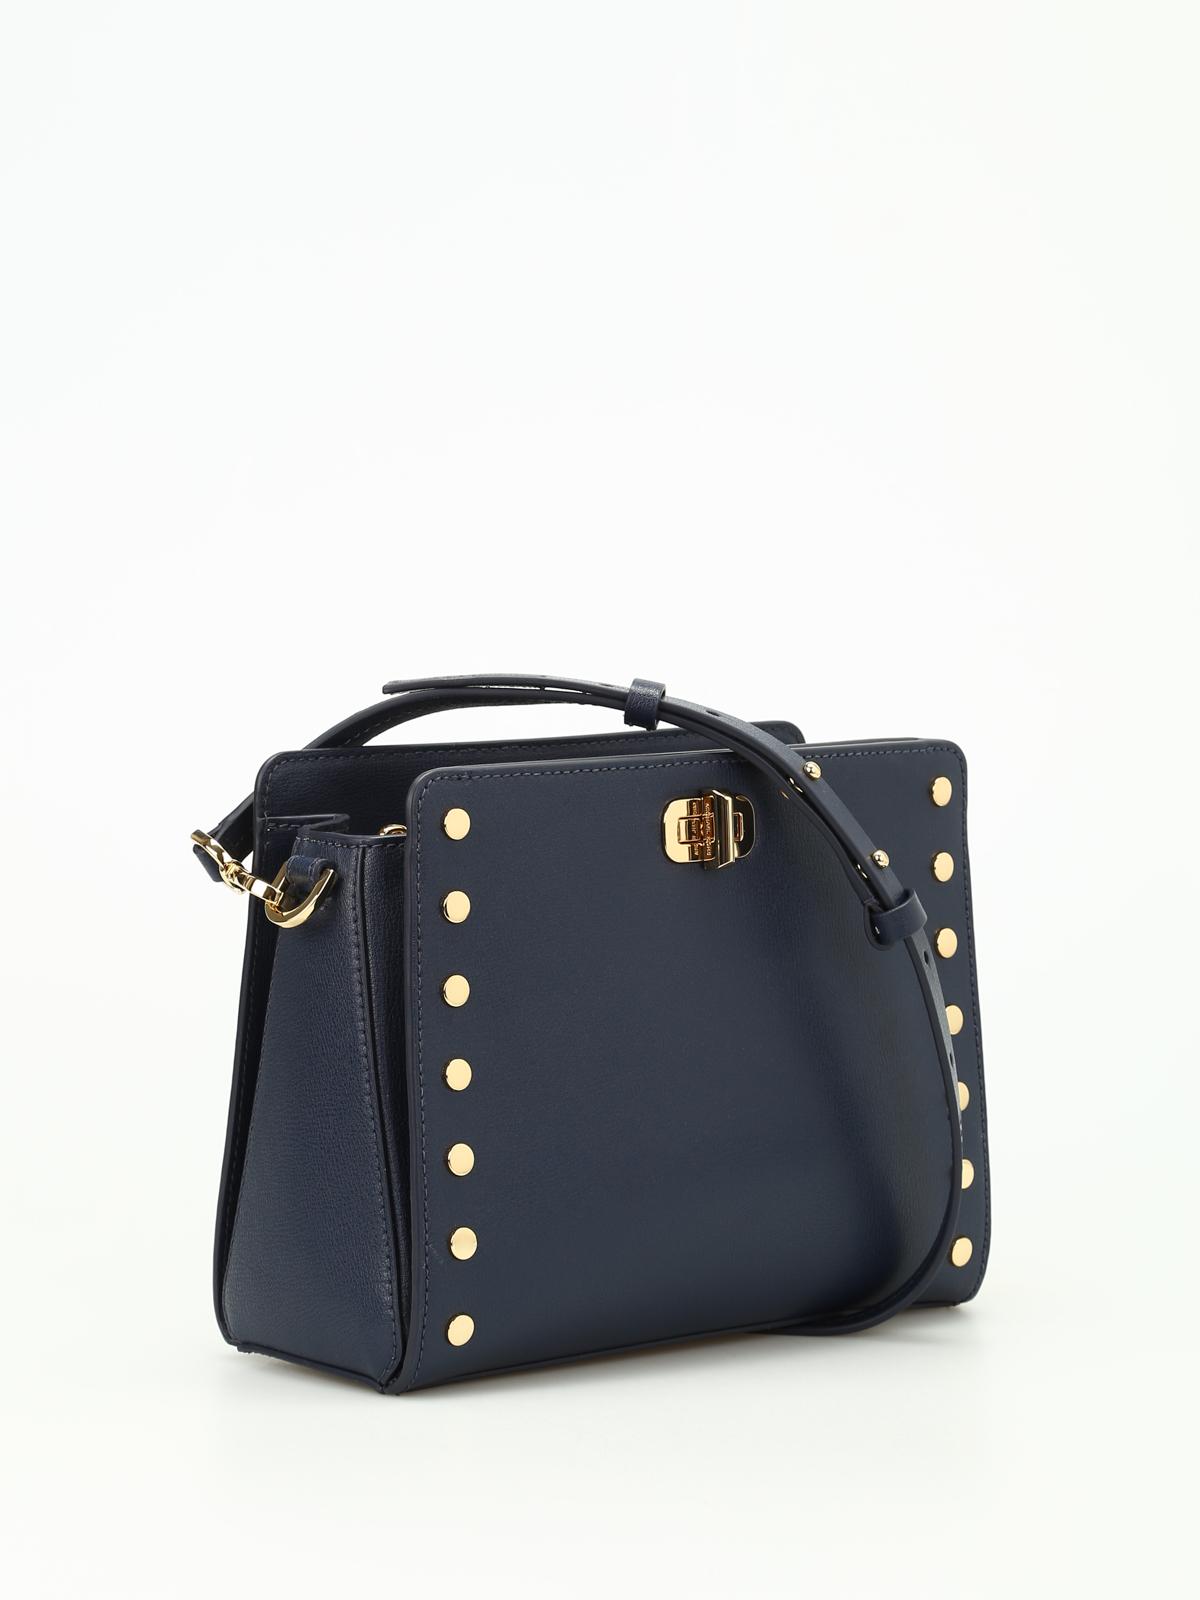 382d8c03ab4d MICHAEL KORS: cross body bags online - Sylvie studded messenger bag